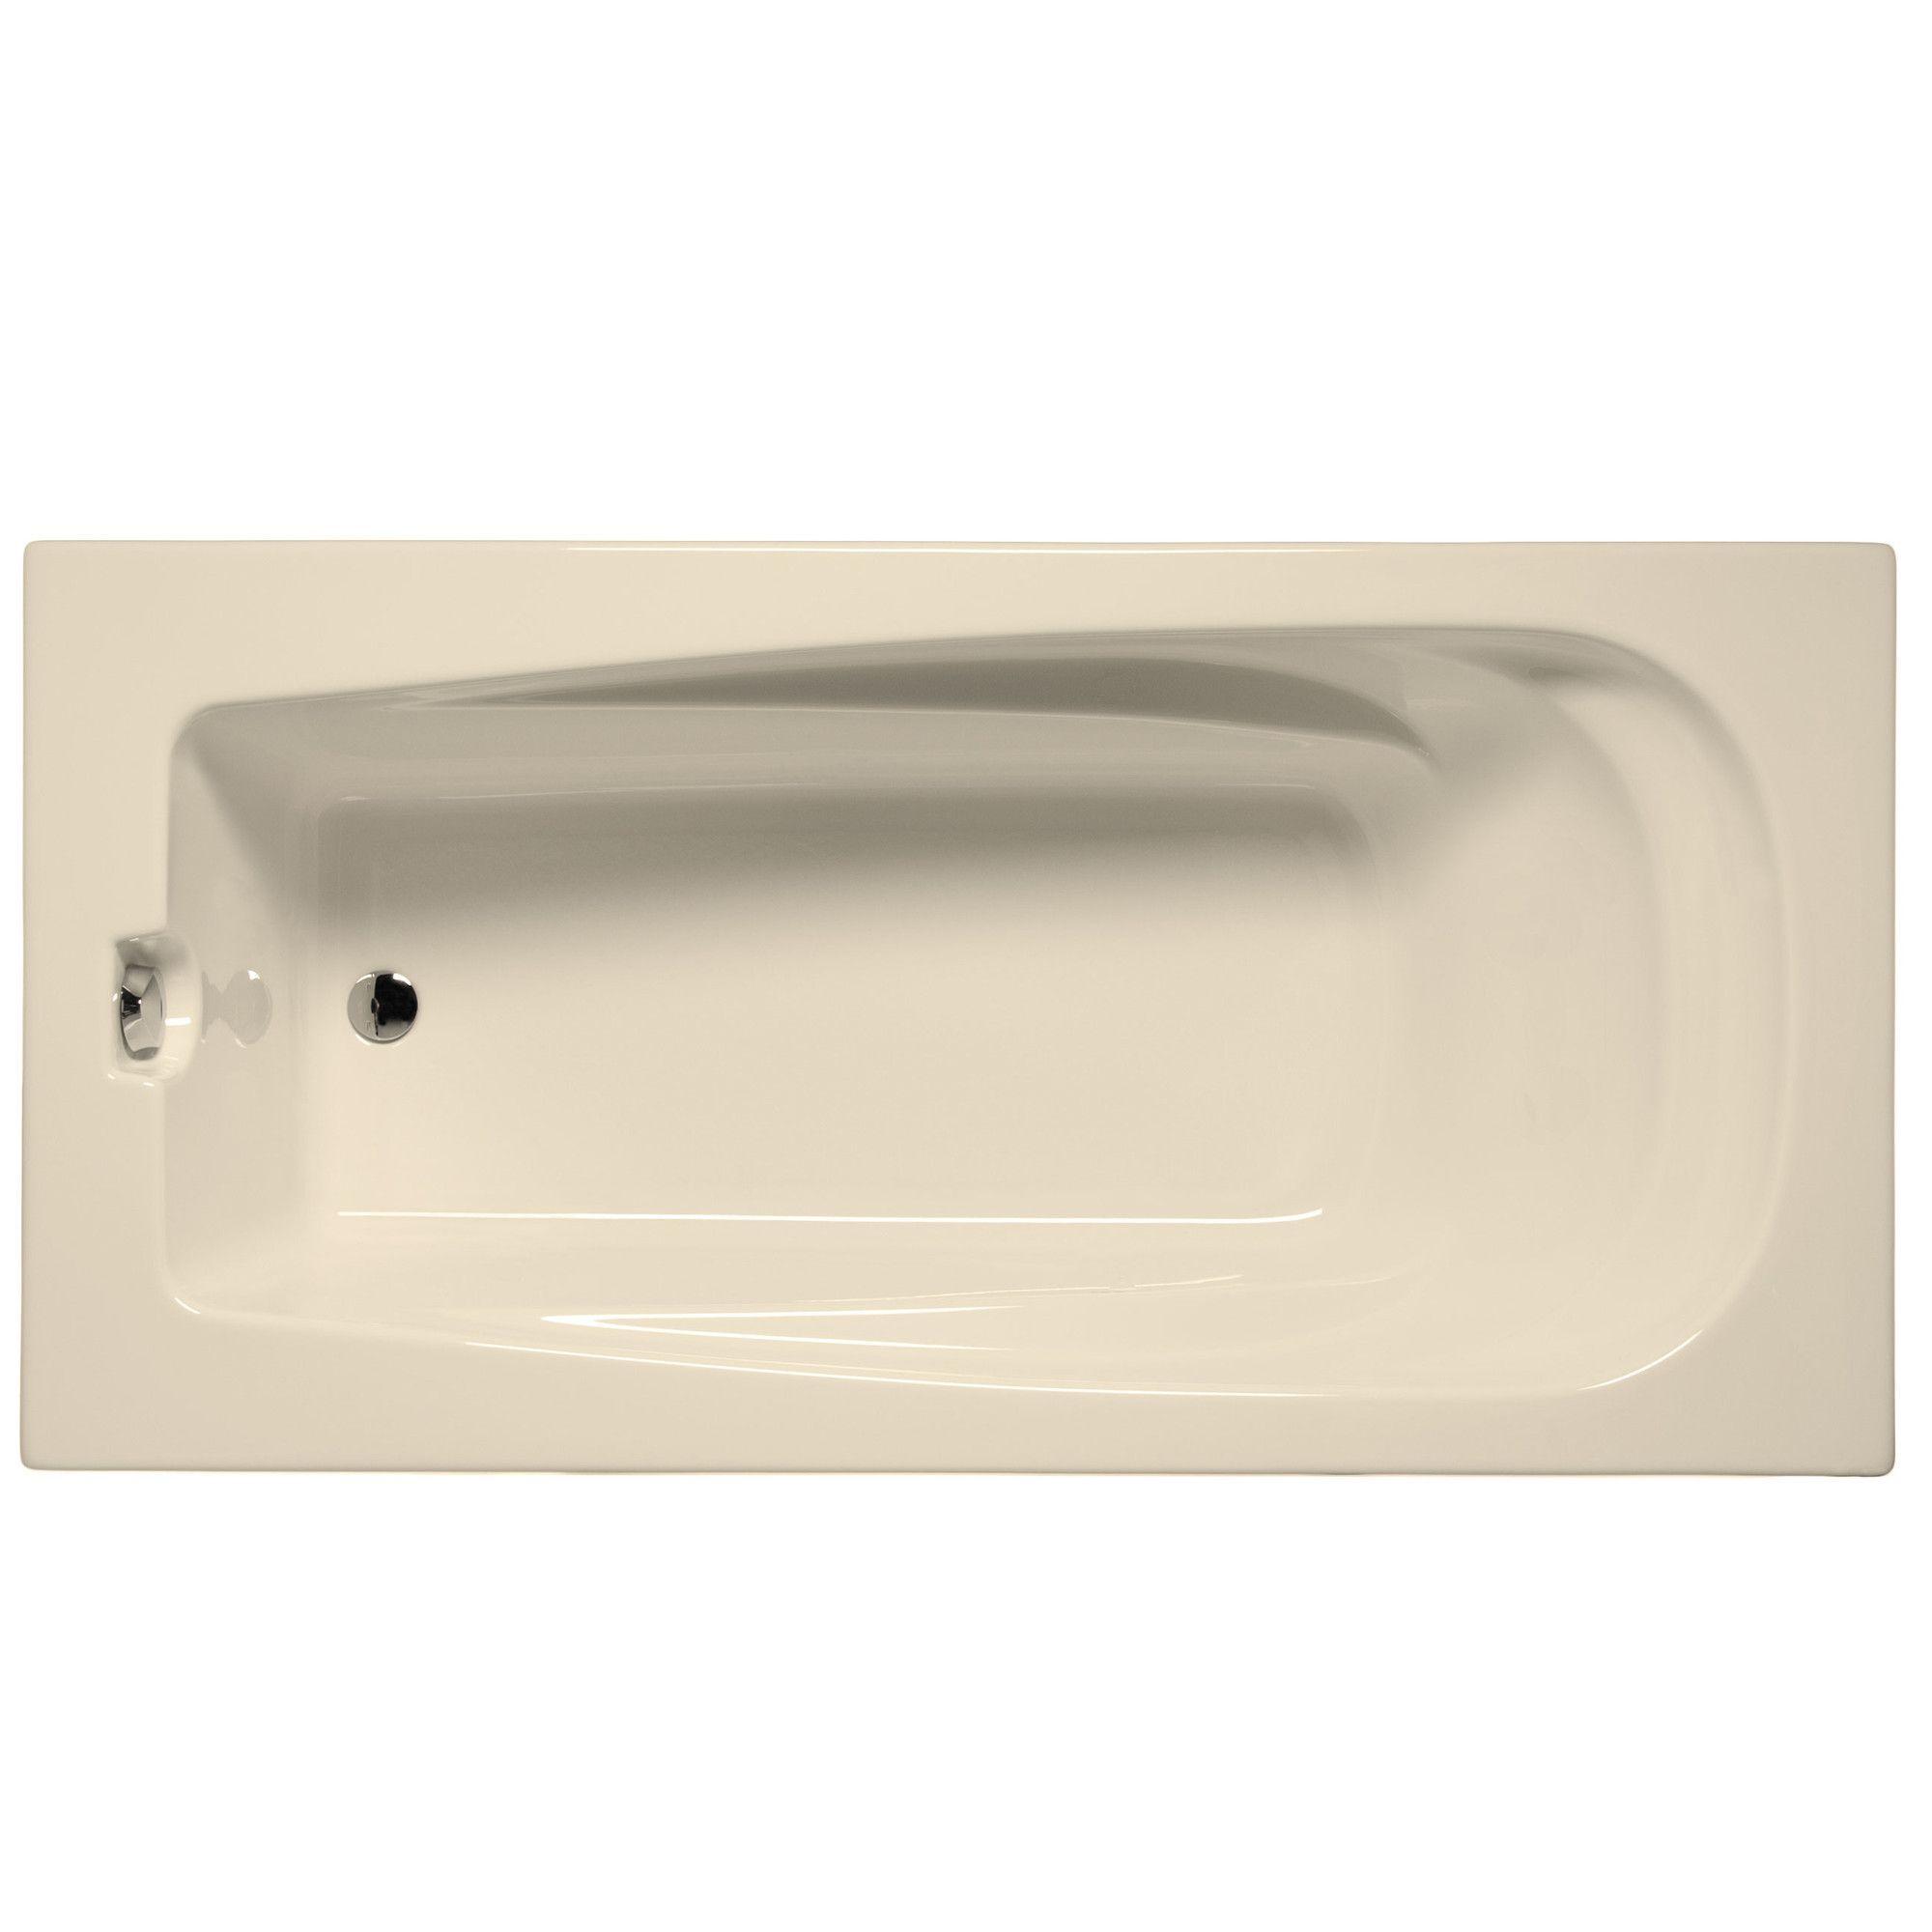 the that bathroom tag bathrooms white dream full of size standing freestanding bathtubs free air bath modern round tub jet tubs